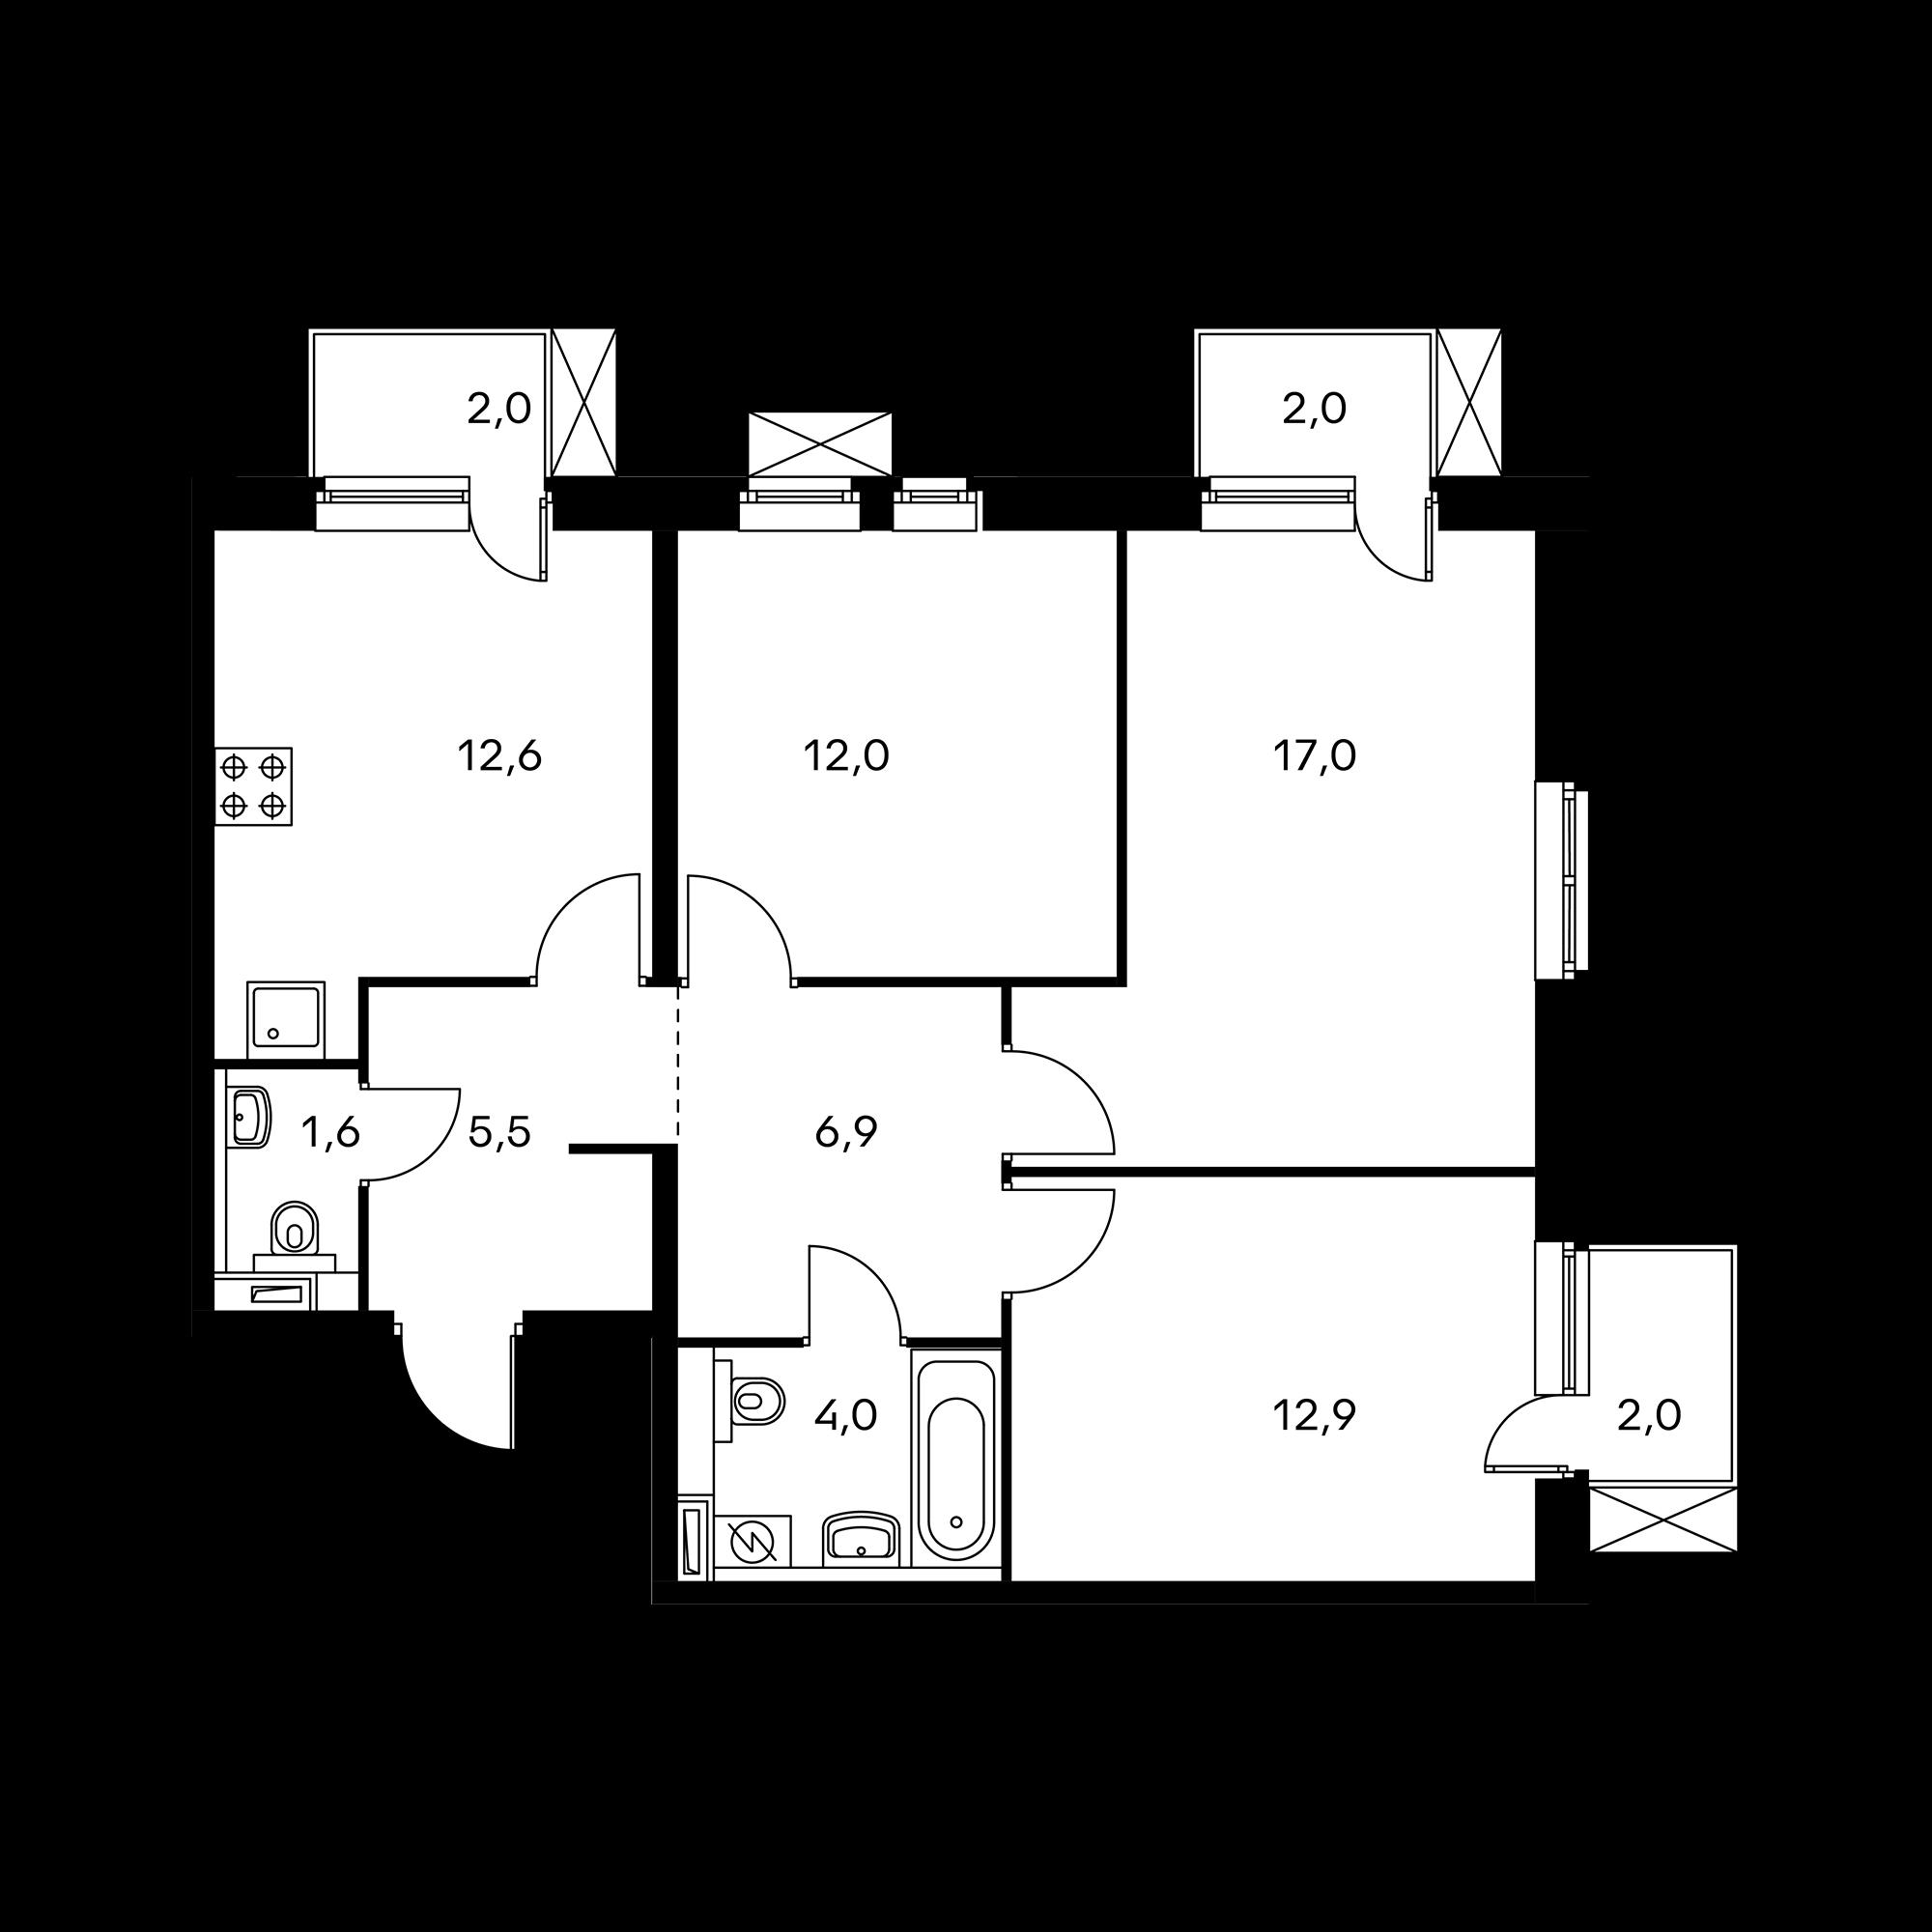 3KM24_10.5-1_T_ZB2